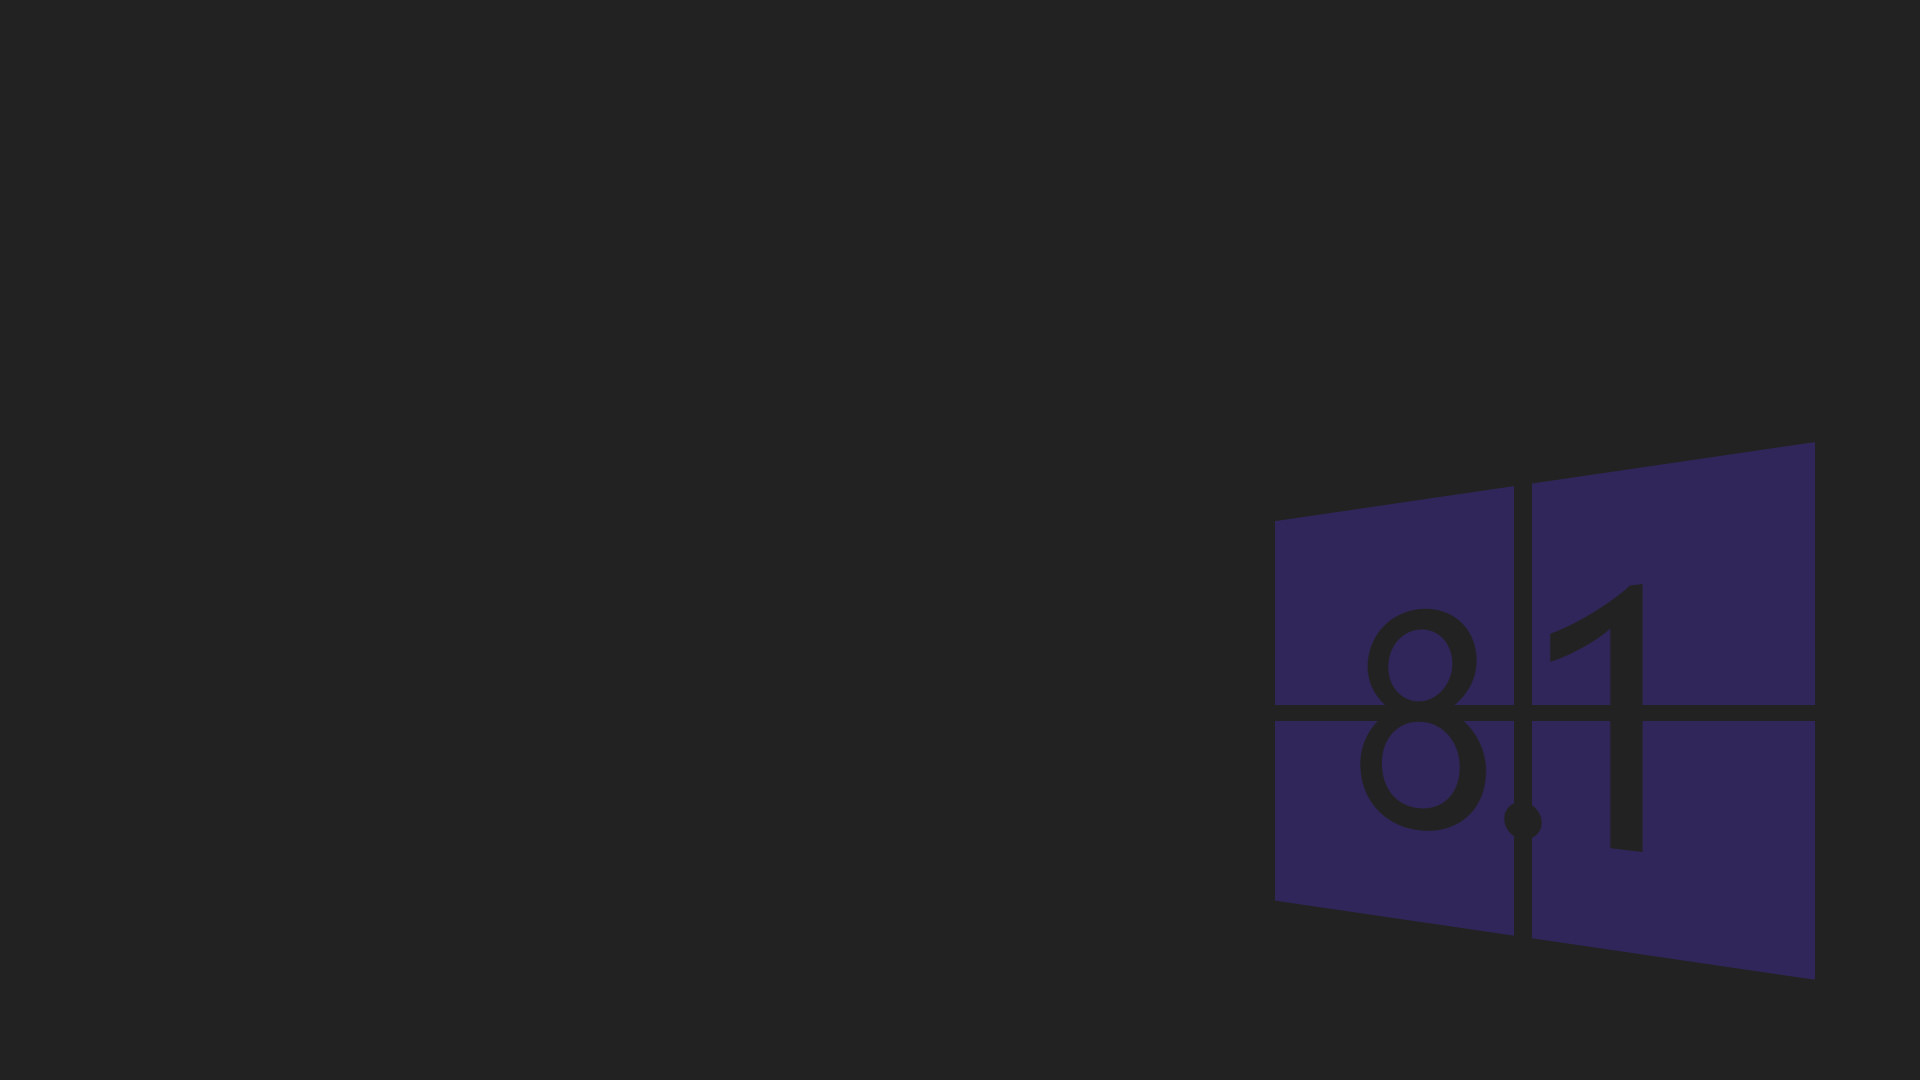 Windows 81 Wallpaper HD 1080p 53 images 1920x1080